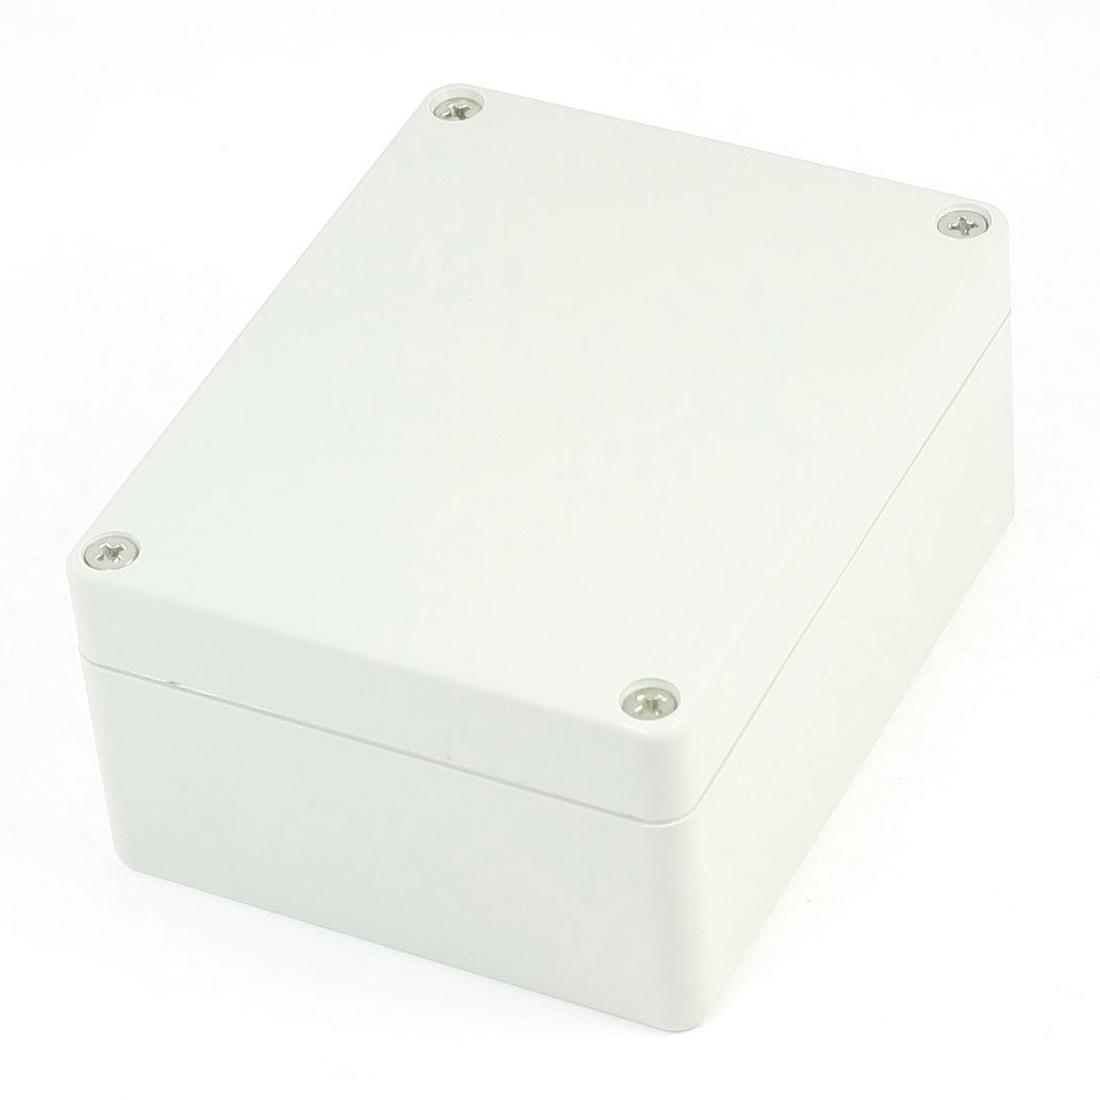 2 Pcs Of MOOL 4.5-inch X 3.5-inch X 2.1-inch Plastic Waterproof Case DIY Box Holder